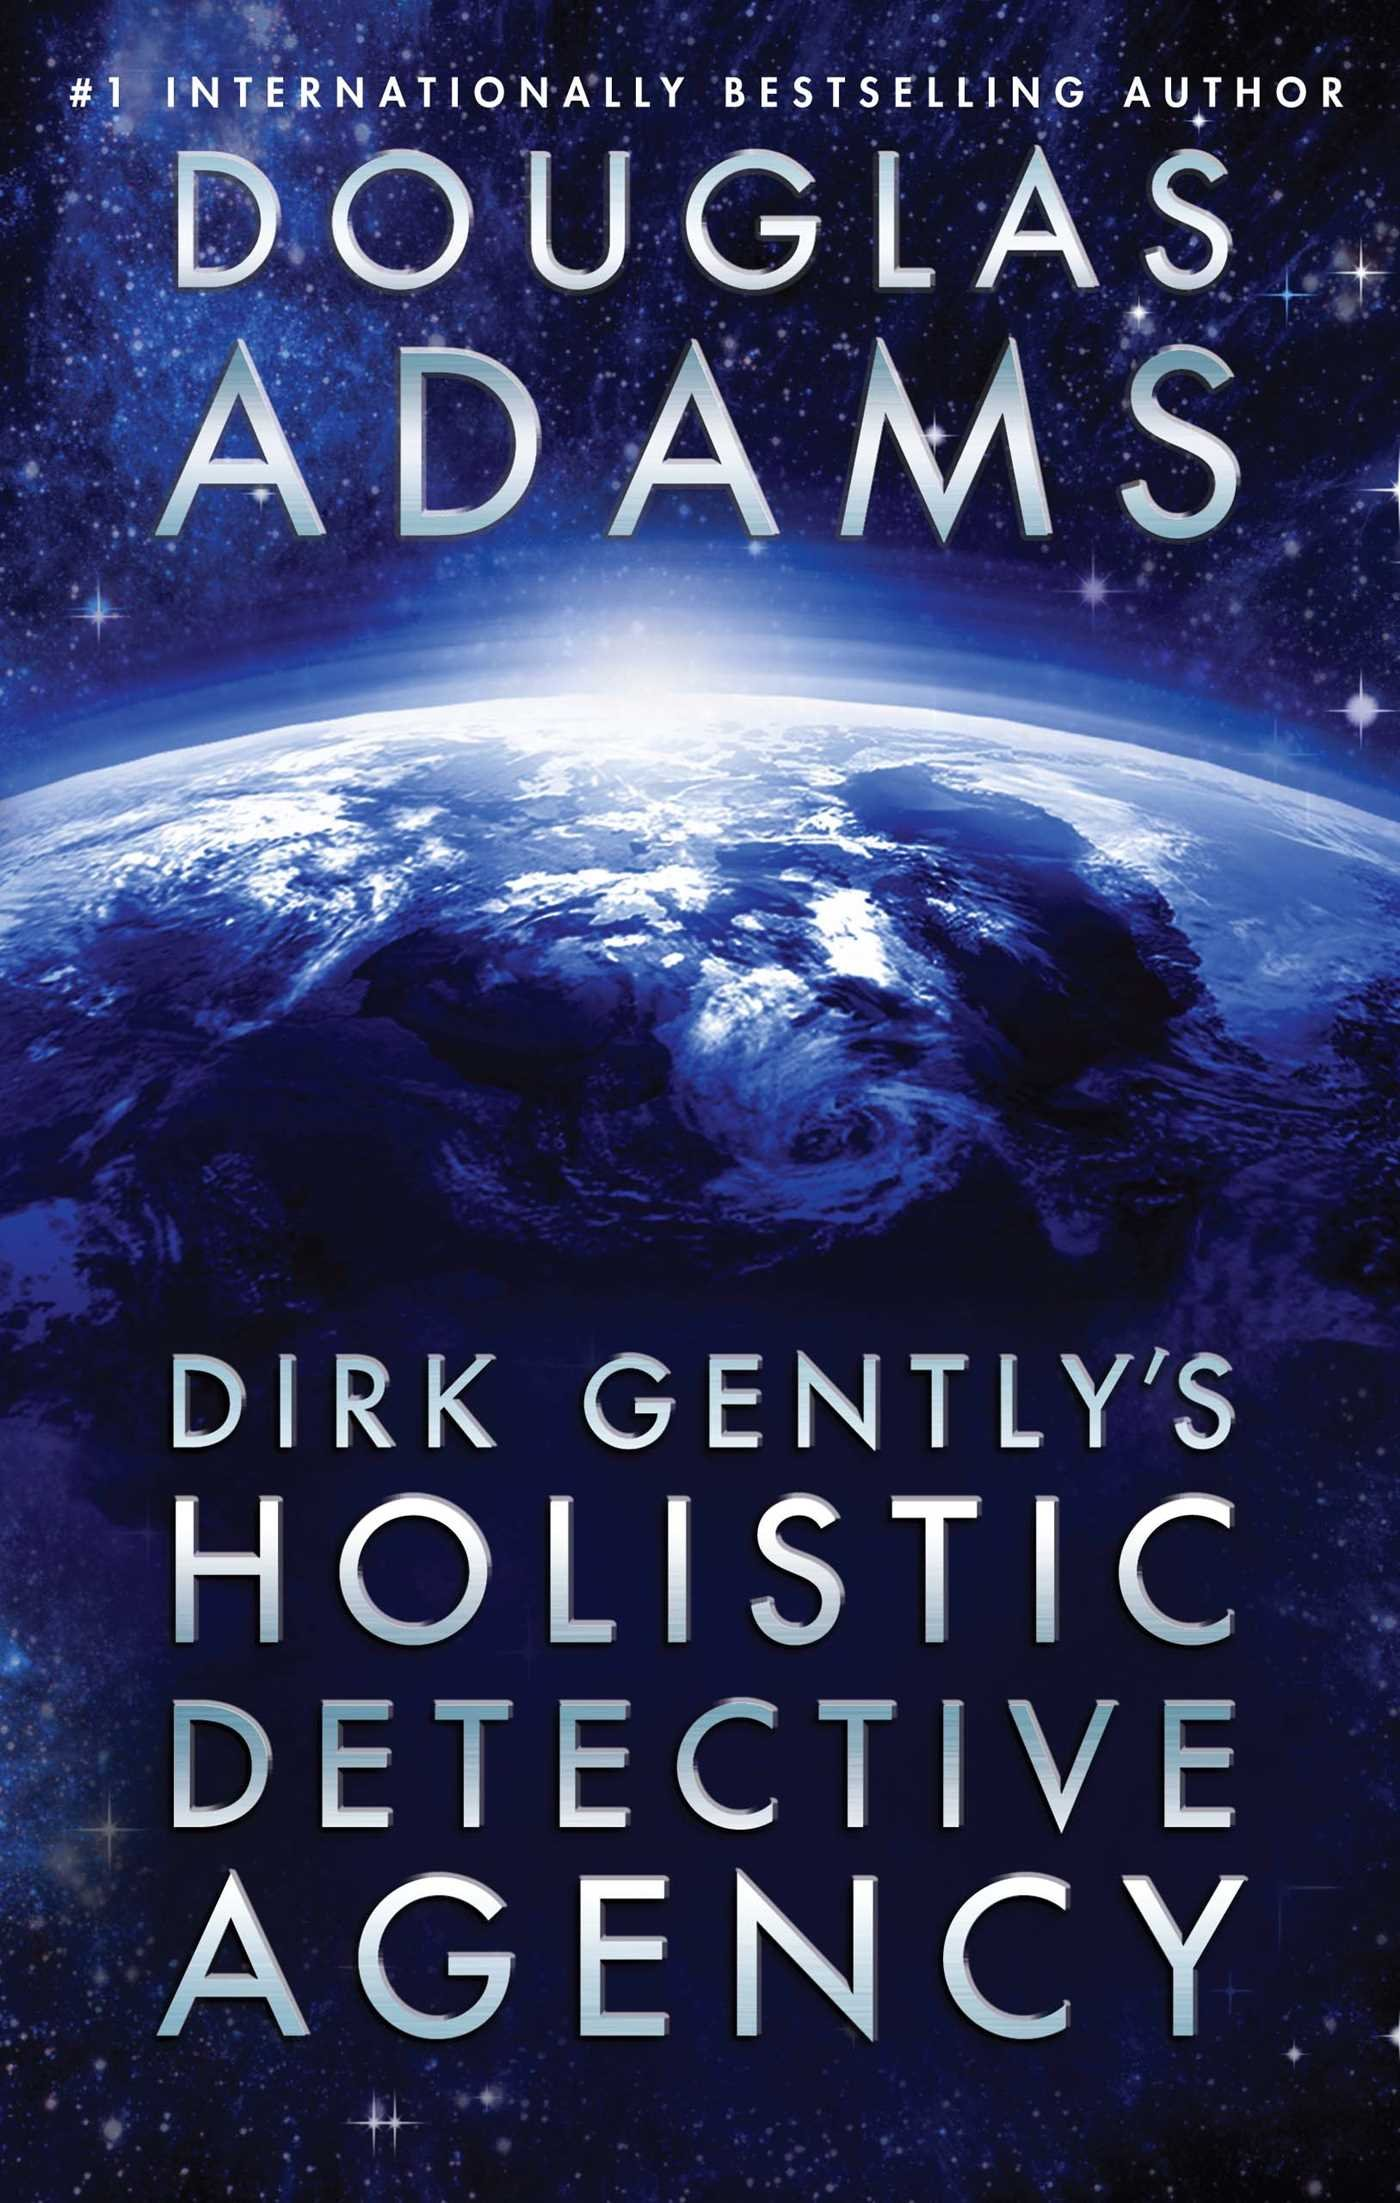 http://boundingintocomics.com/wp-content/uploads/2016/01/Dirk-Gentlys-Holistic-Detective-Agency.jpg